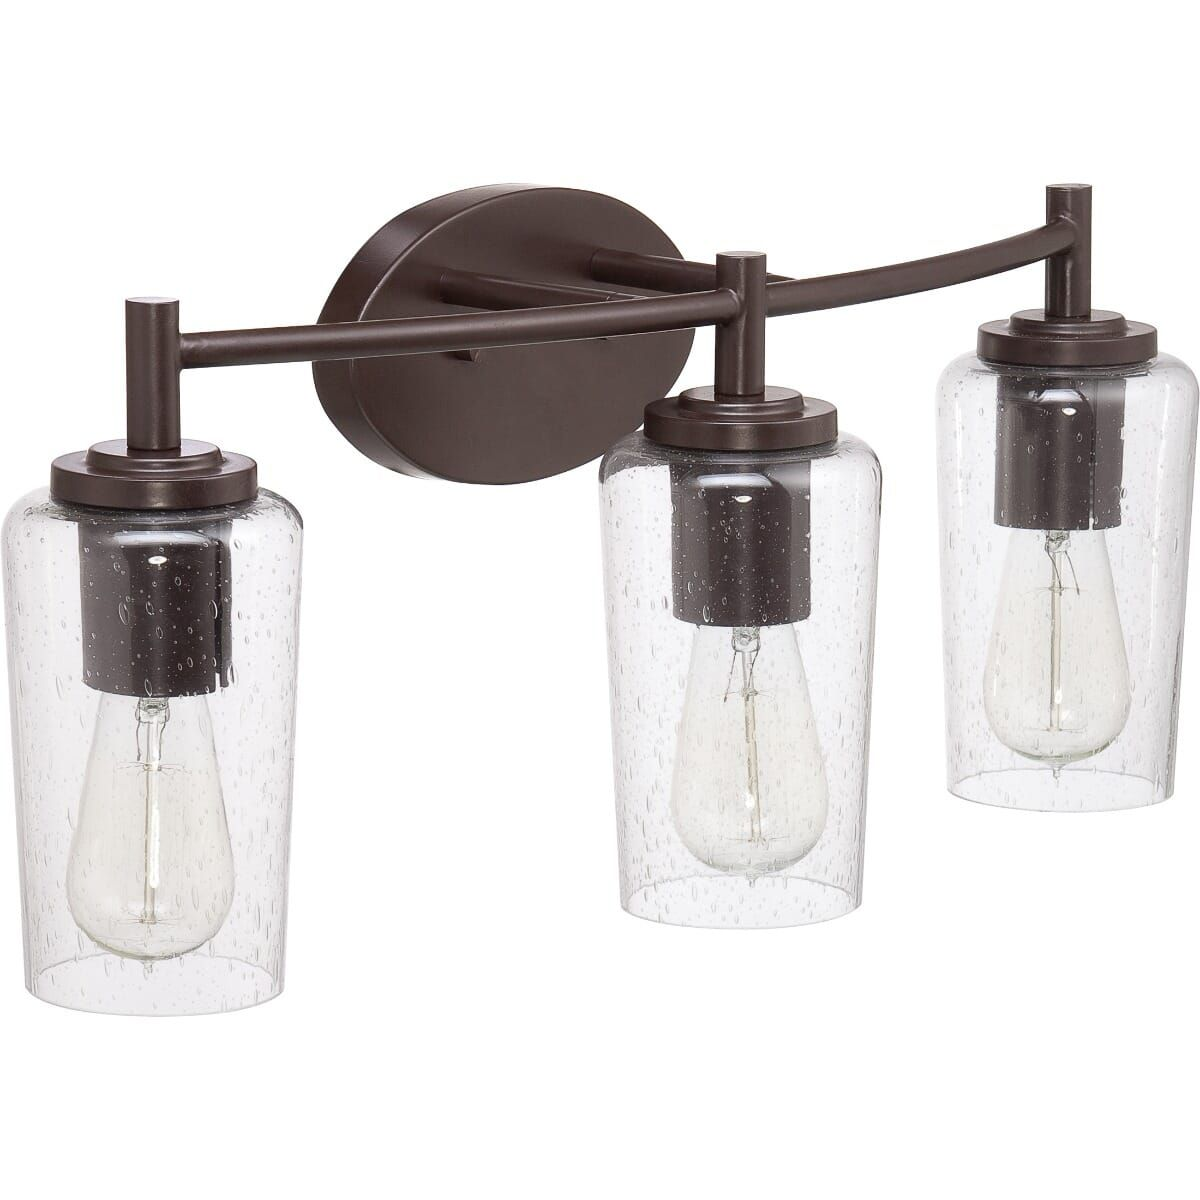 "Photo of Quoizel Edison 3-Light 10 ""bathroom basin lamp in Western Bronze"